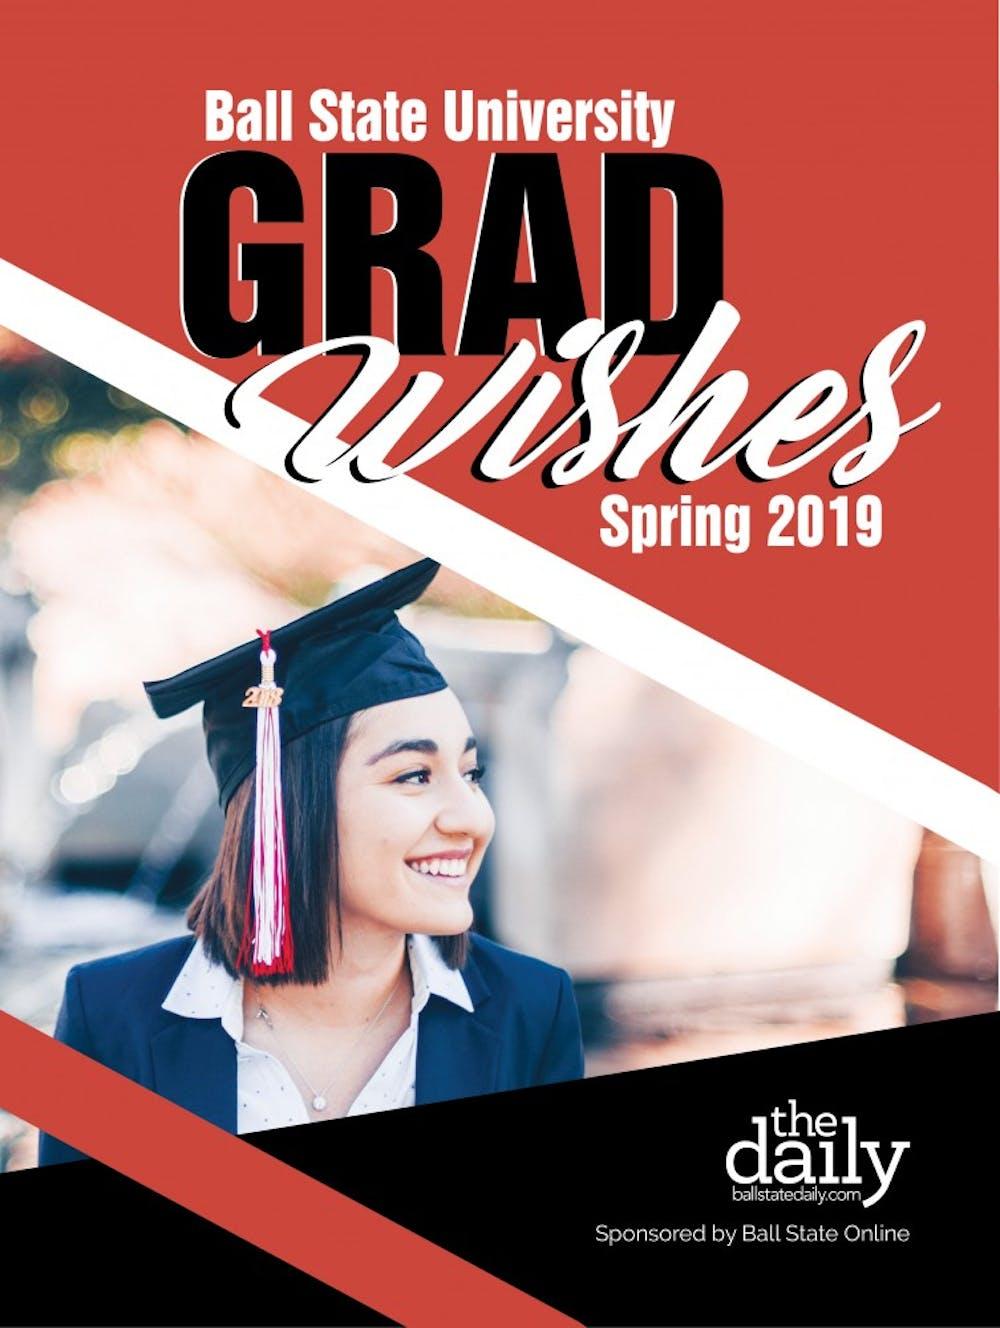 BSU Grad Wishes Cover.jpg